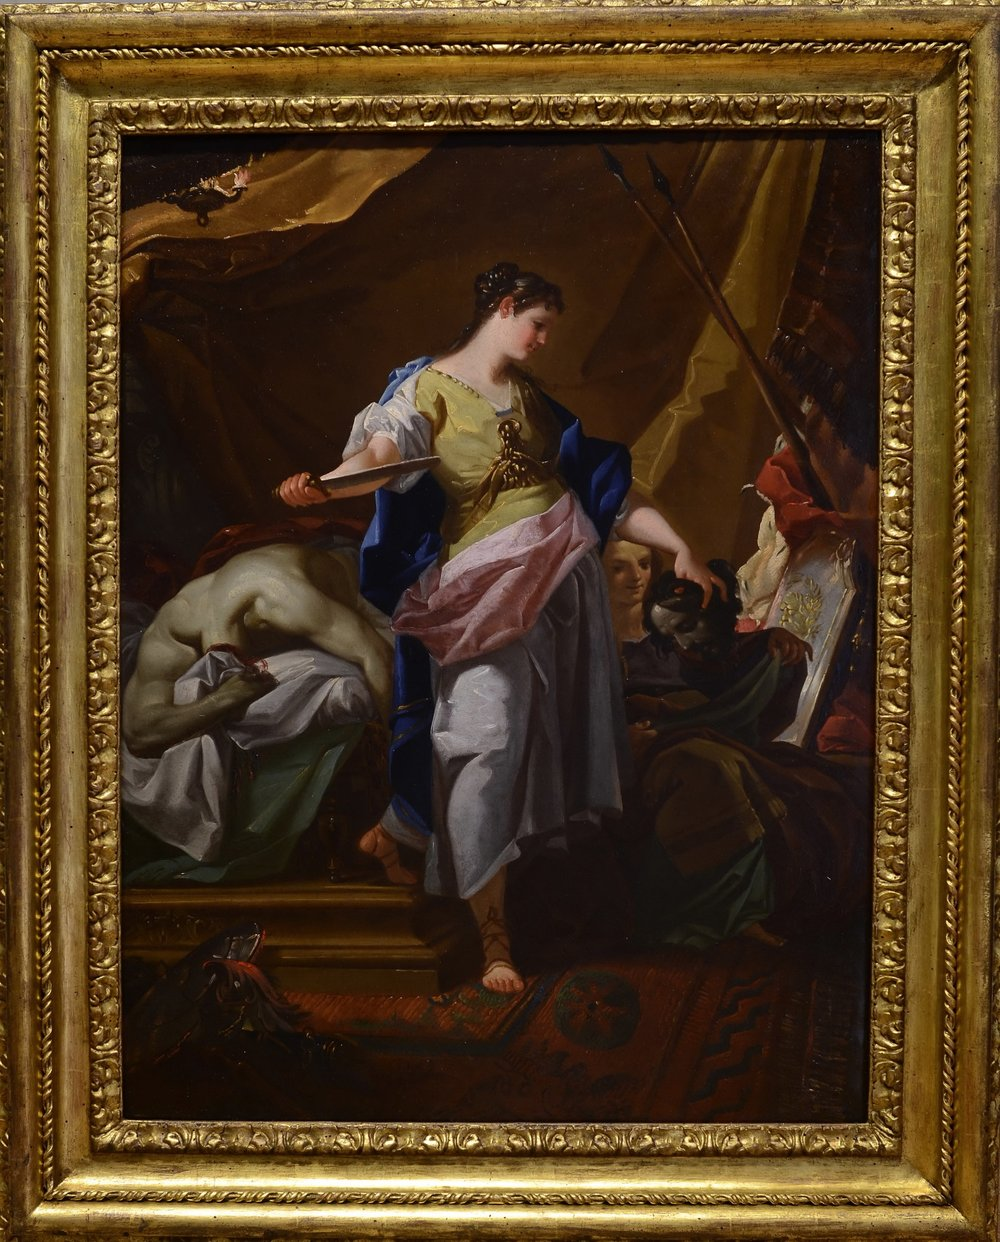 CORRADO GIAQUINTO   (Molfetta 1703 – 1766 Naples)     Judith and Holofernes     Oil on copper  35 1/8 x 26 3/8 inches  (89 x 67 cm)